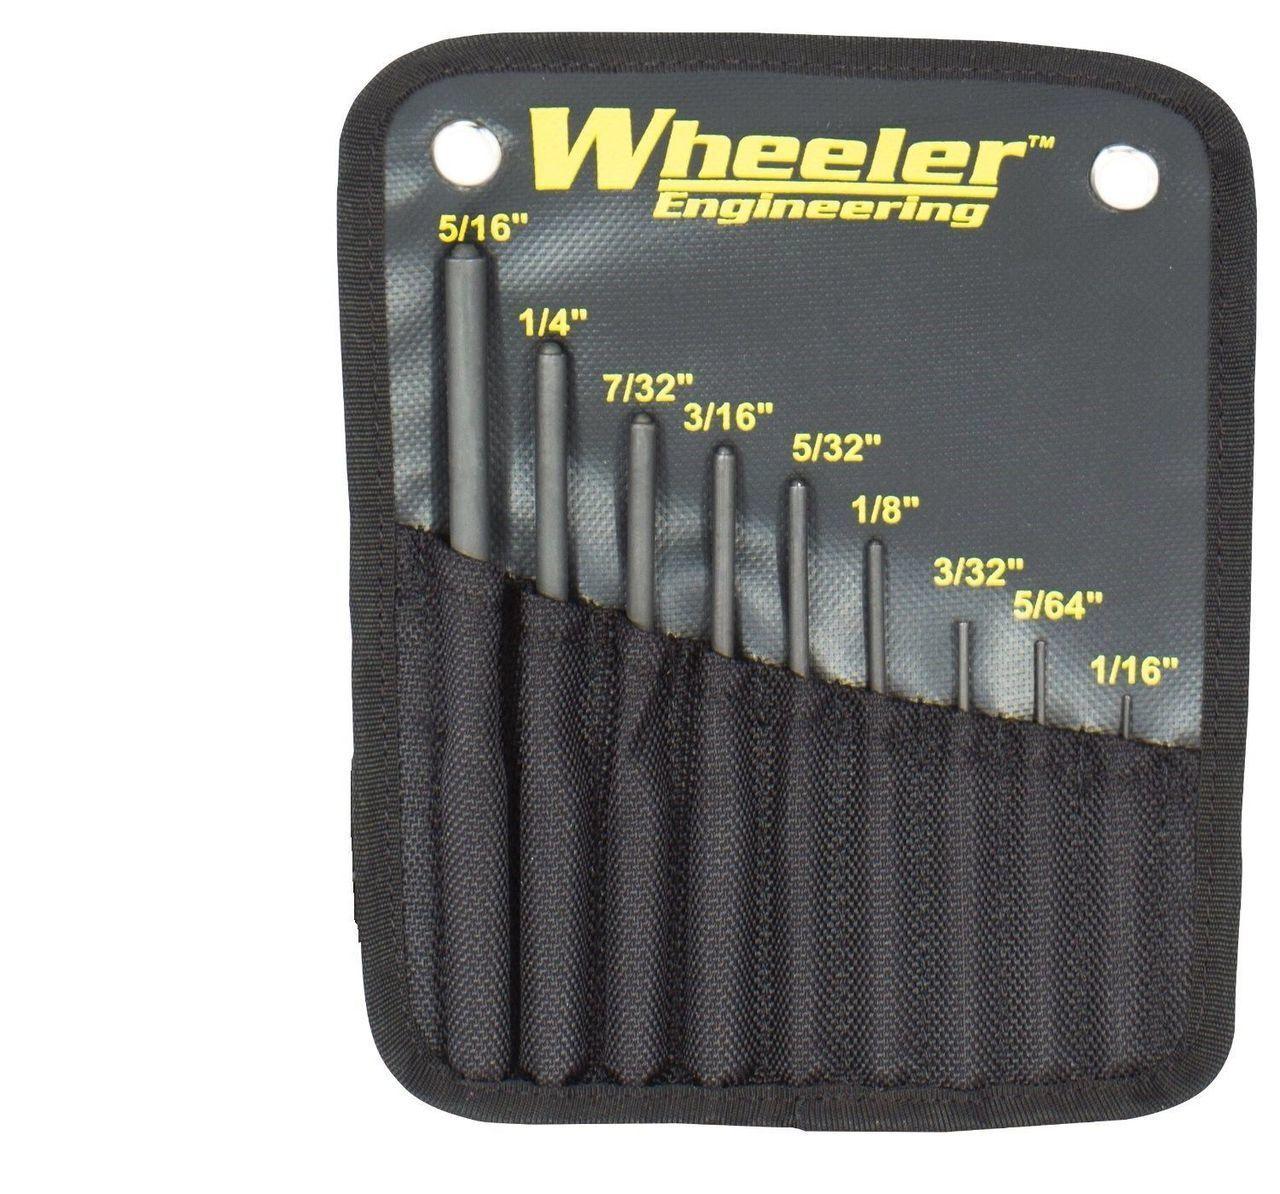 Wheeler Roll Pin Punch Set 9 PC 204513